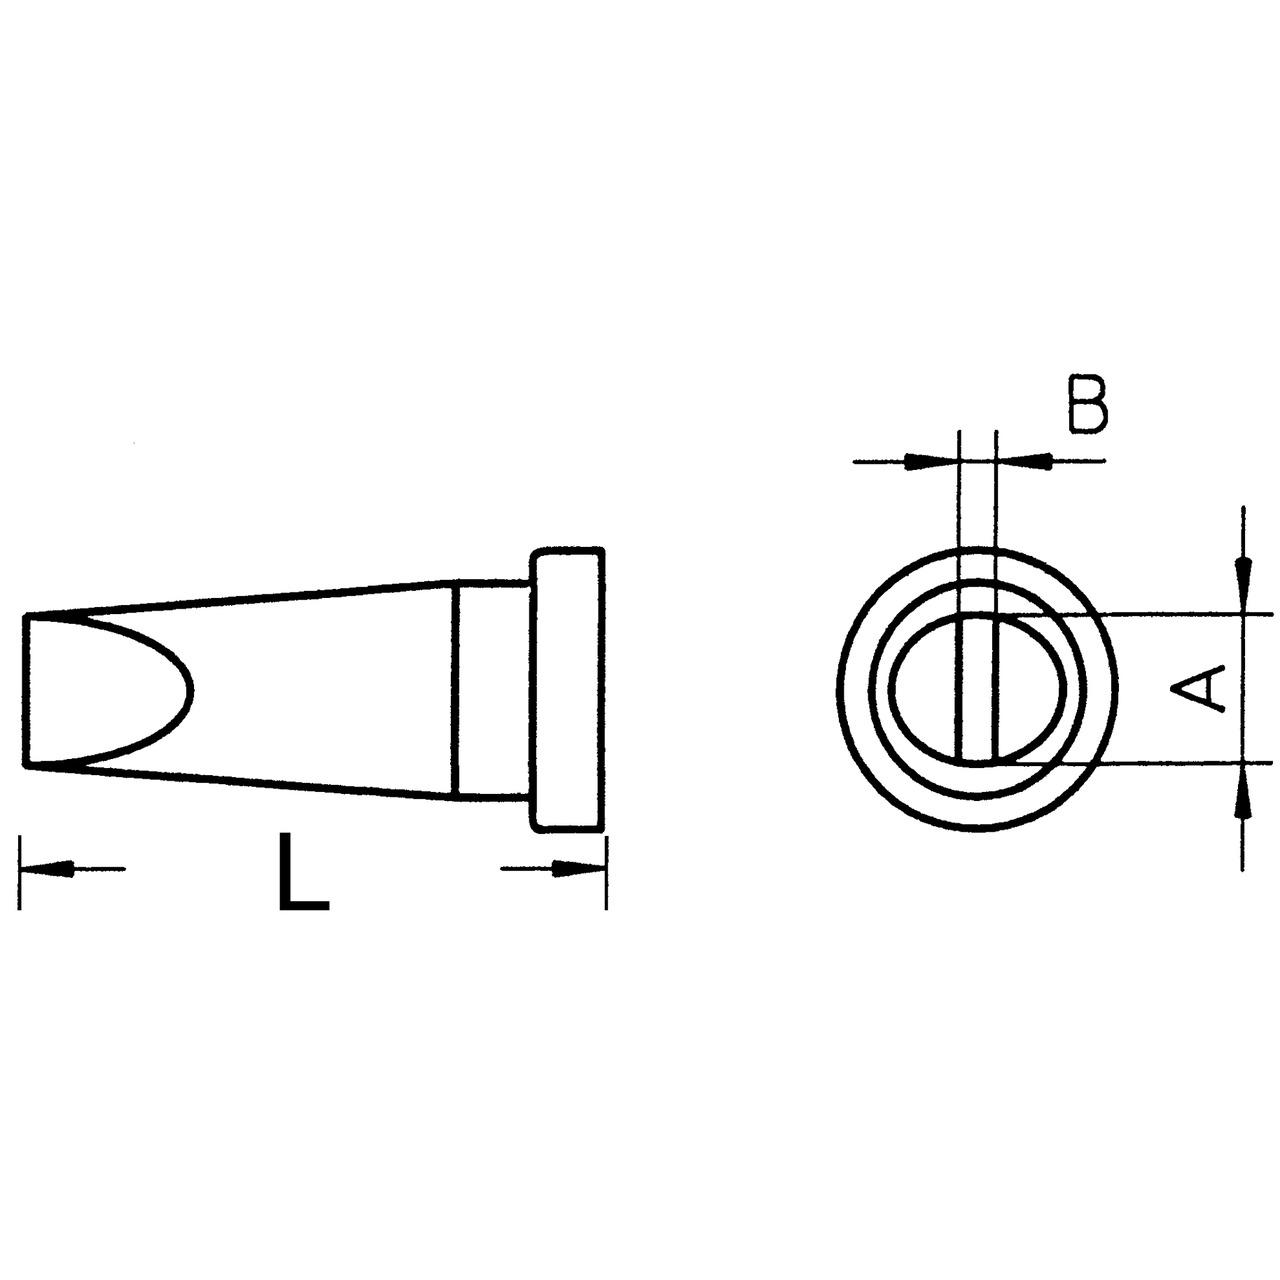 Weller Ersatzl鰐spitze LT H- meisself鰎mig- Spitze 0-8 mm breit